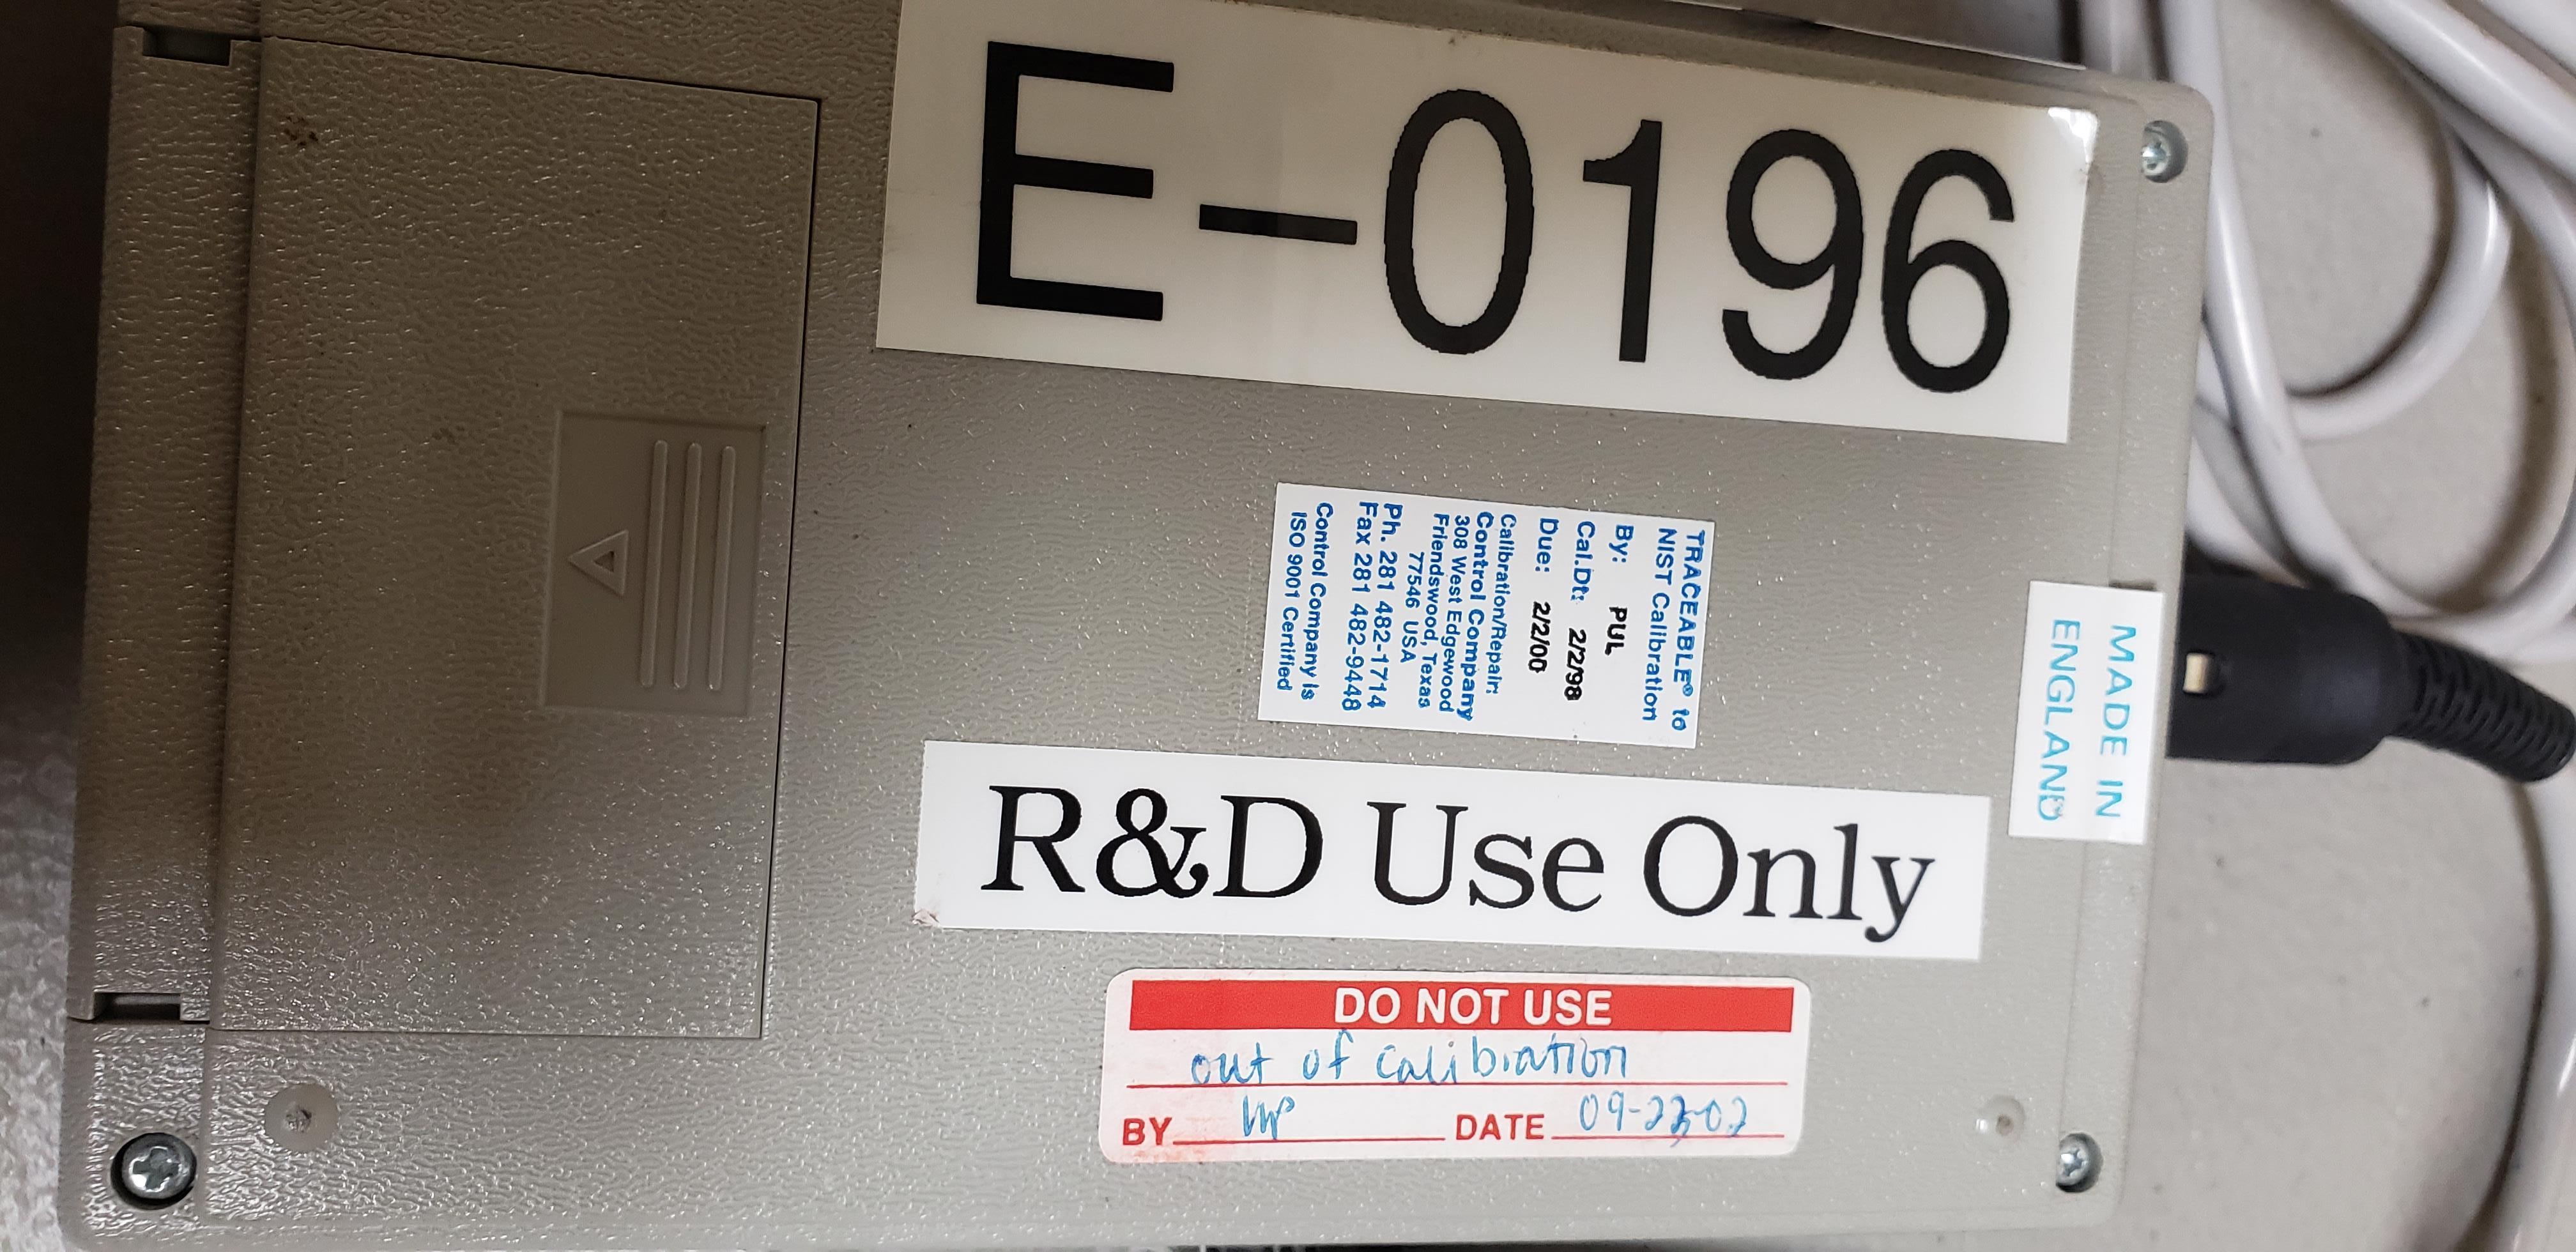 Lot 23 - VWR Digital Conductivity Meter